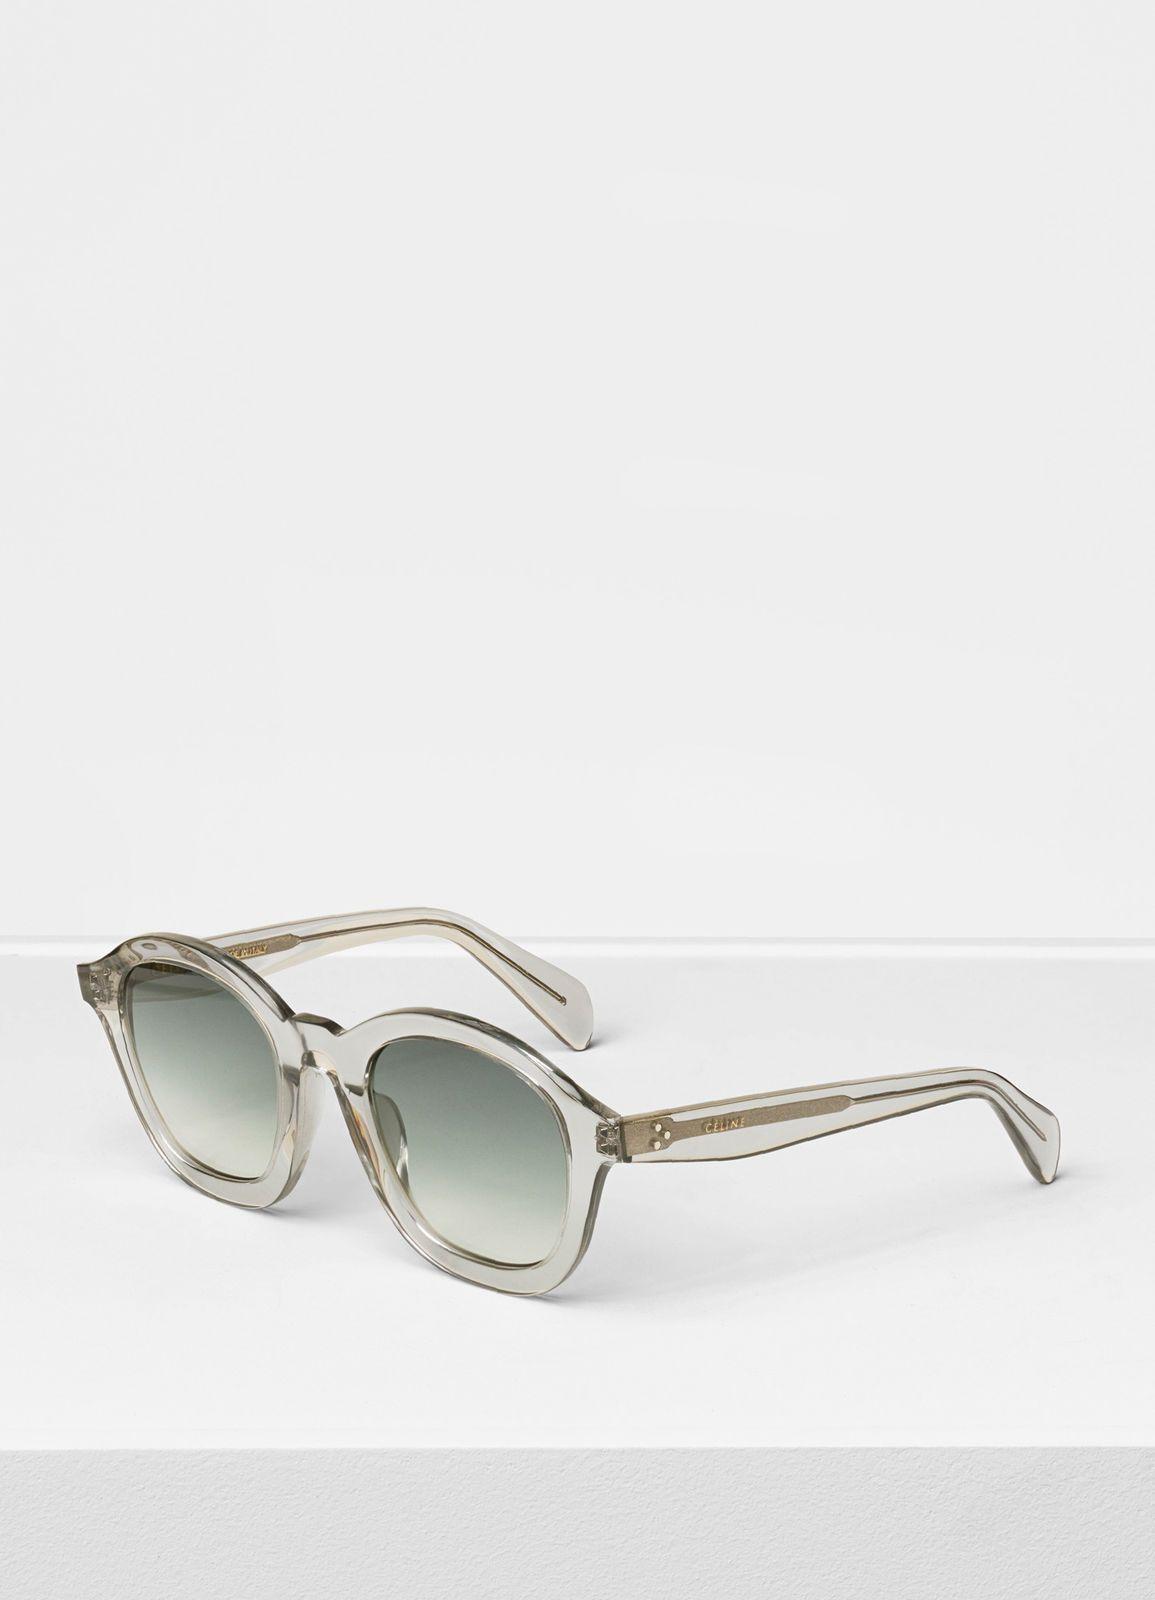 74f60b71805c Céline - Light grey round sunglasses in acetate